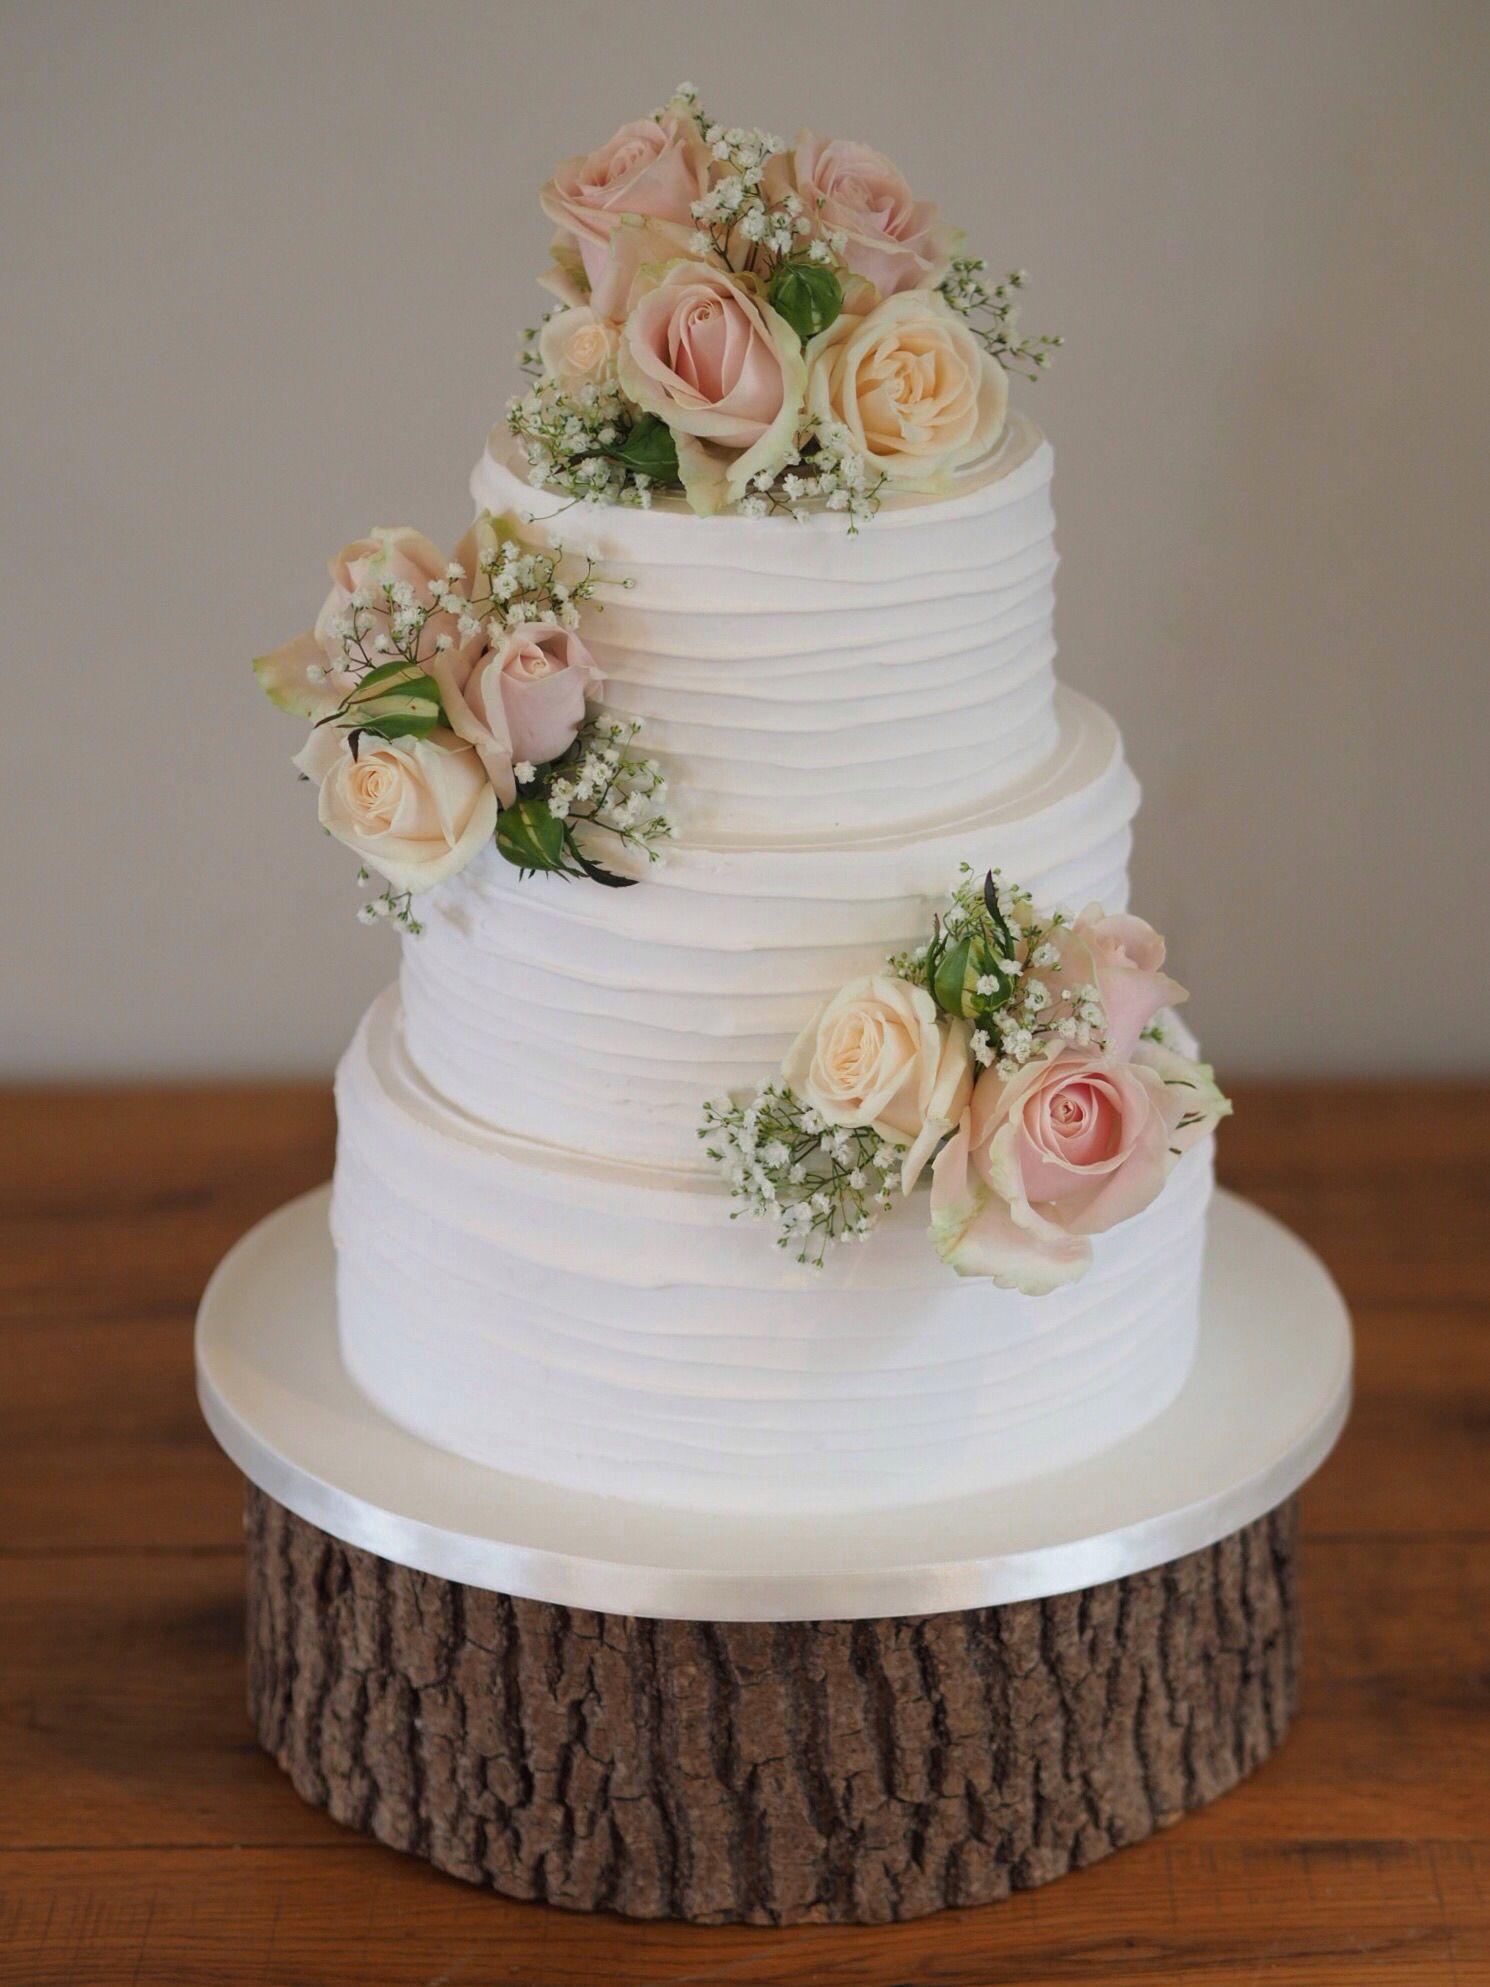 Swirled Textured Soft Iced Wedding Cake By Sarah Louise Cakes Wedding Cake Fresh Flowers Wedding Cake Icing Designs Wedding Cake Icing